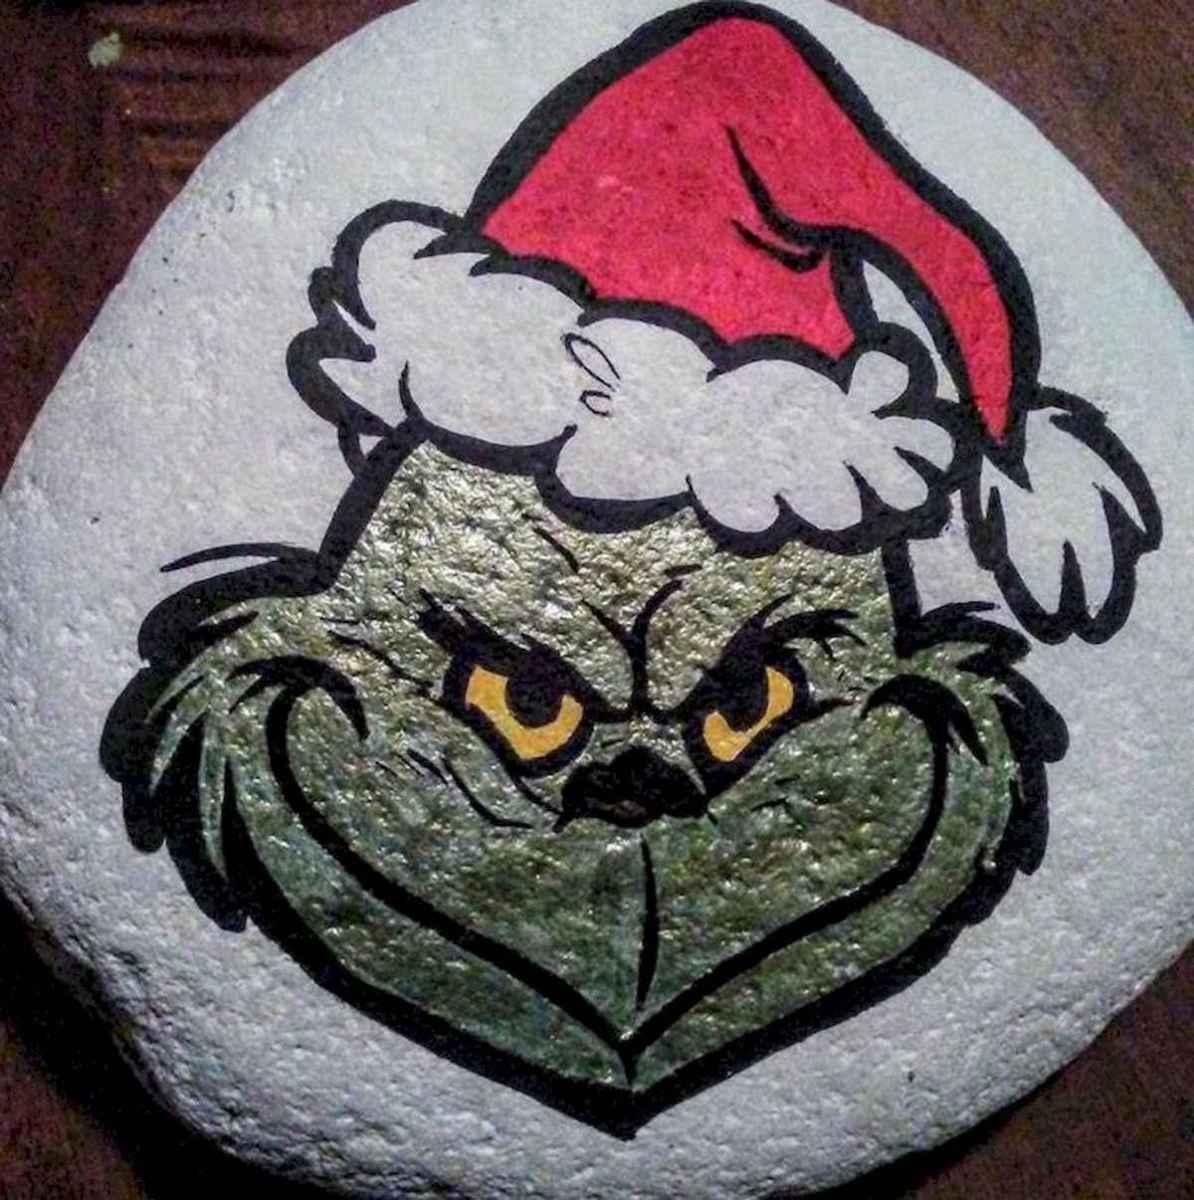 50 Easy DIY Christmas Painted Rock Design Ideas (10)